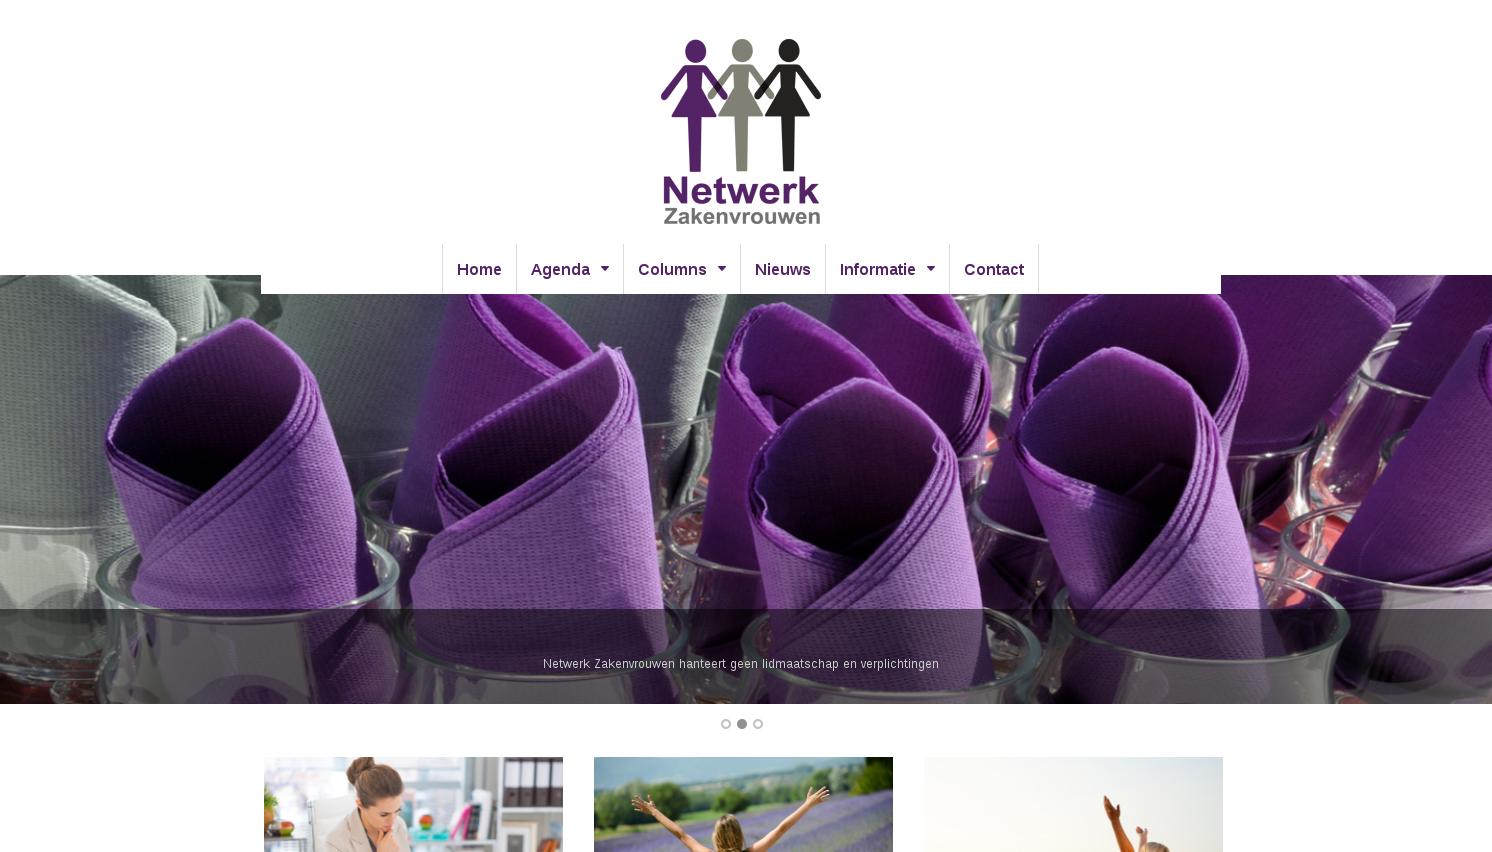 netwerkzakenvrouwen-home1